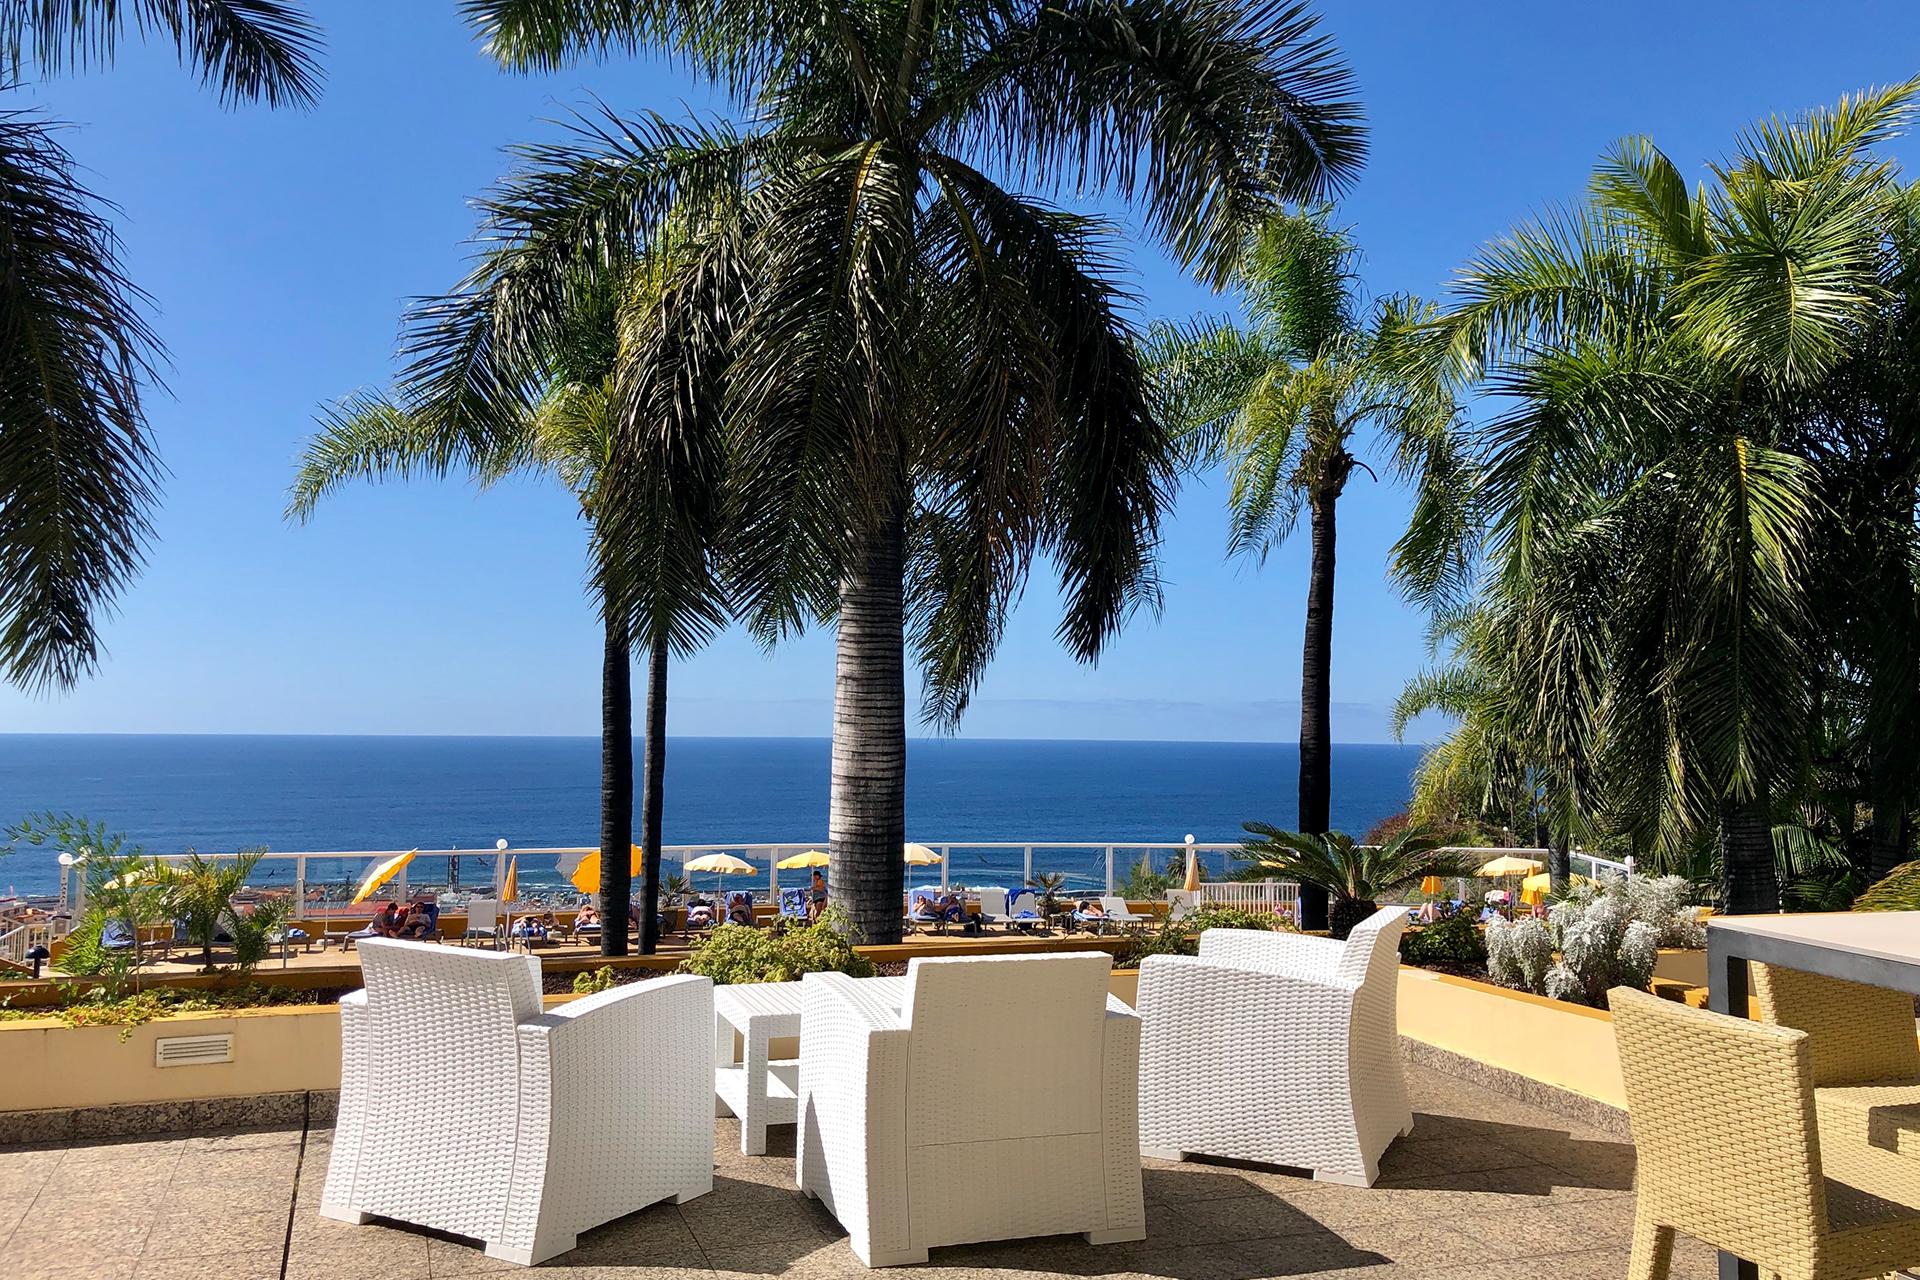 Terrasse des Tigaiga Hotels auf Teneriffa